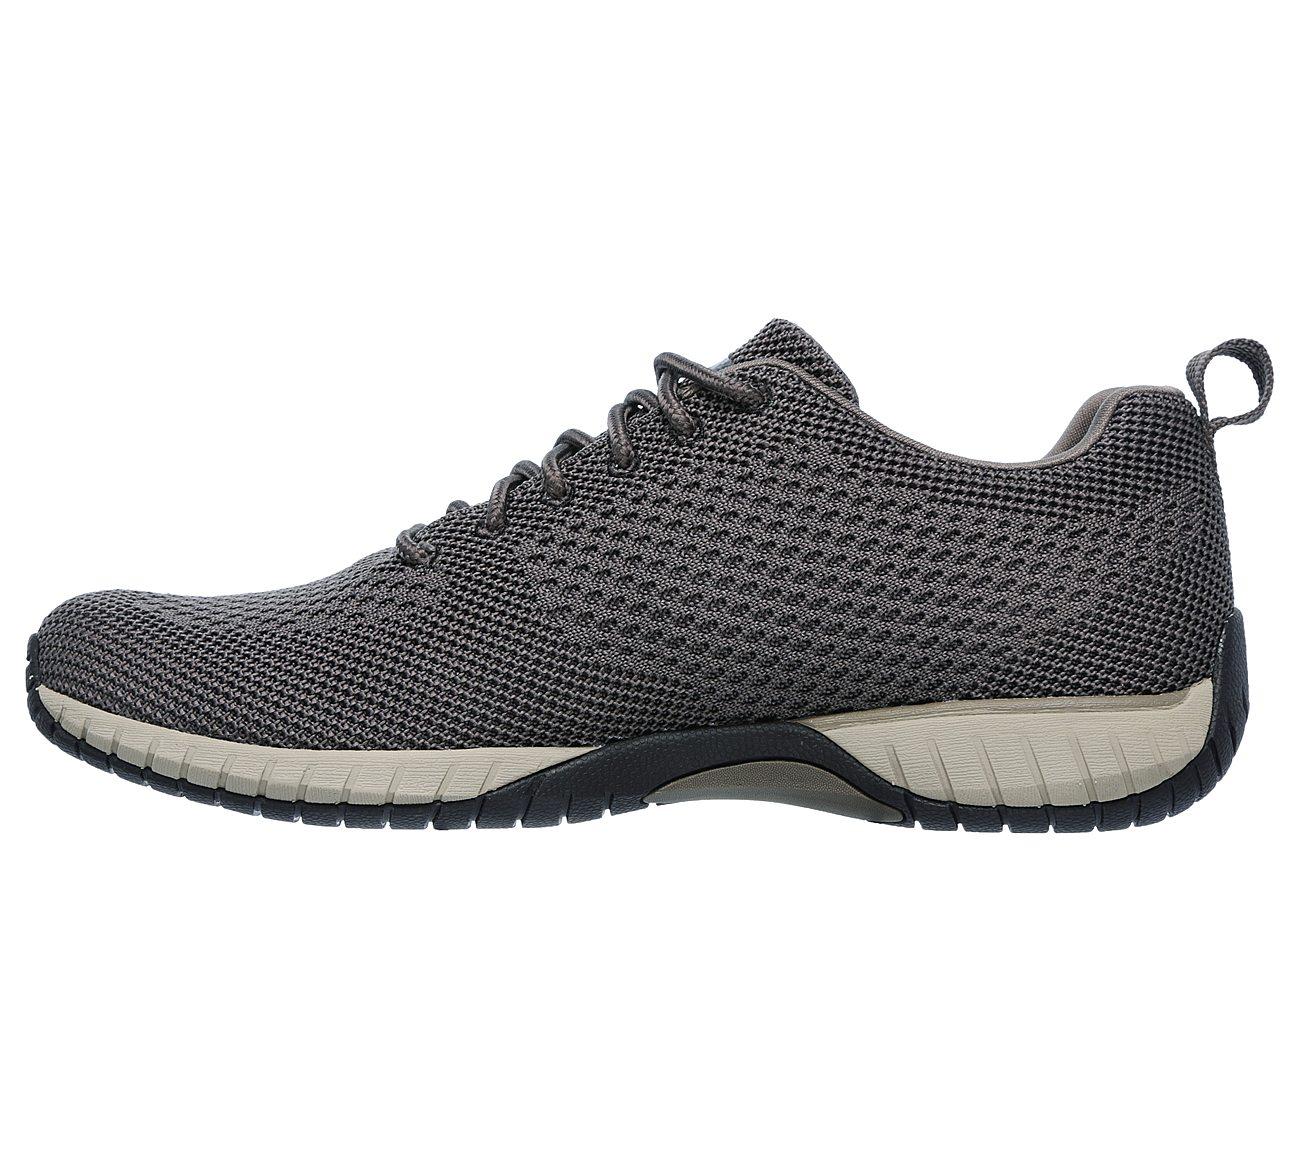 75d4f3d6e397 Buy SKECHERS Sendro - Jensen Shoes only  46.00